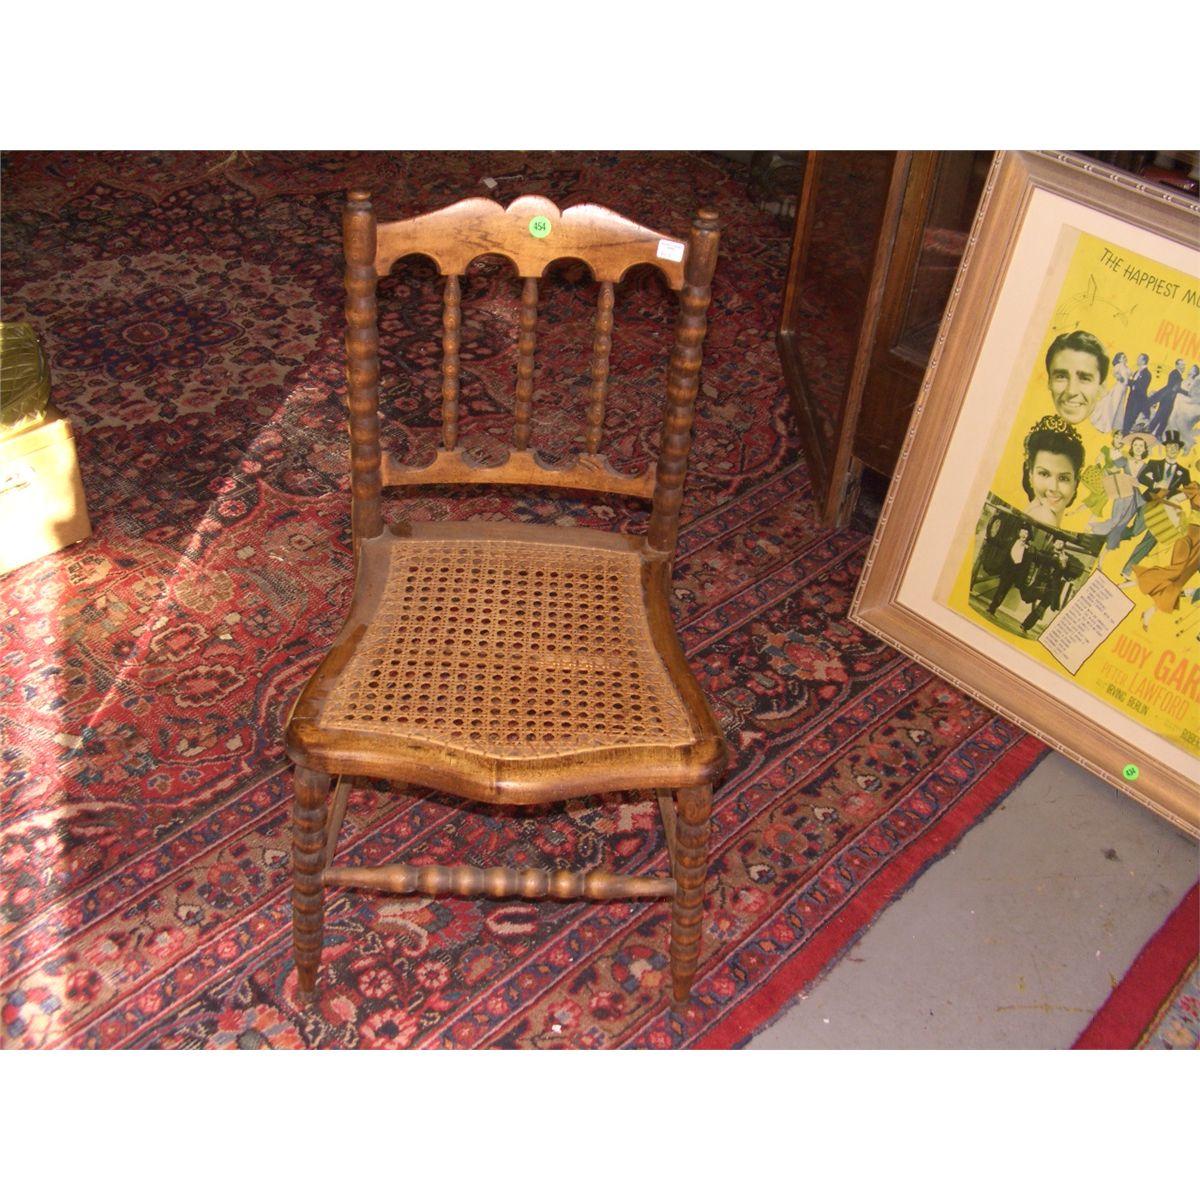 antique cane seat chairs antique child's cane seat chair antique cane seat chairs